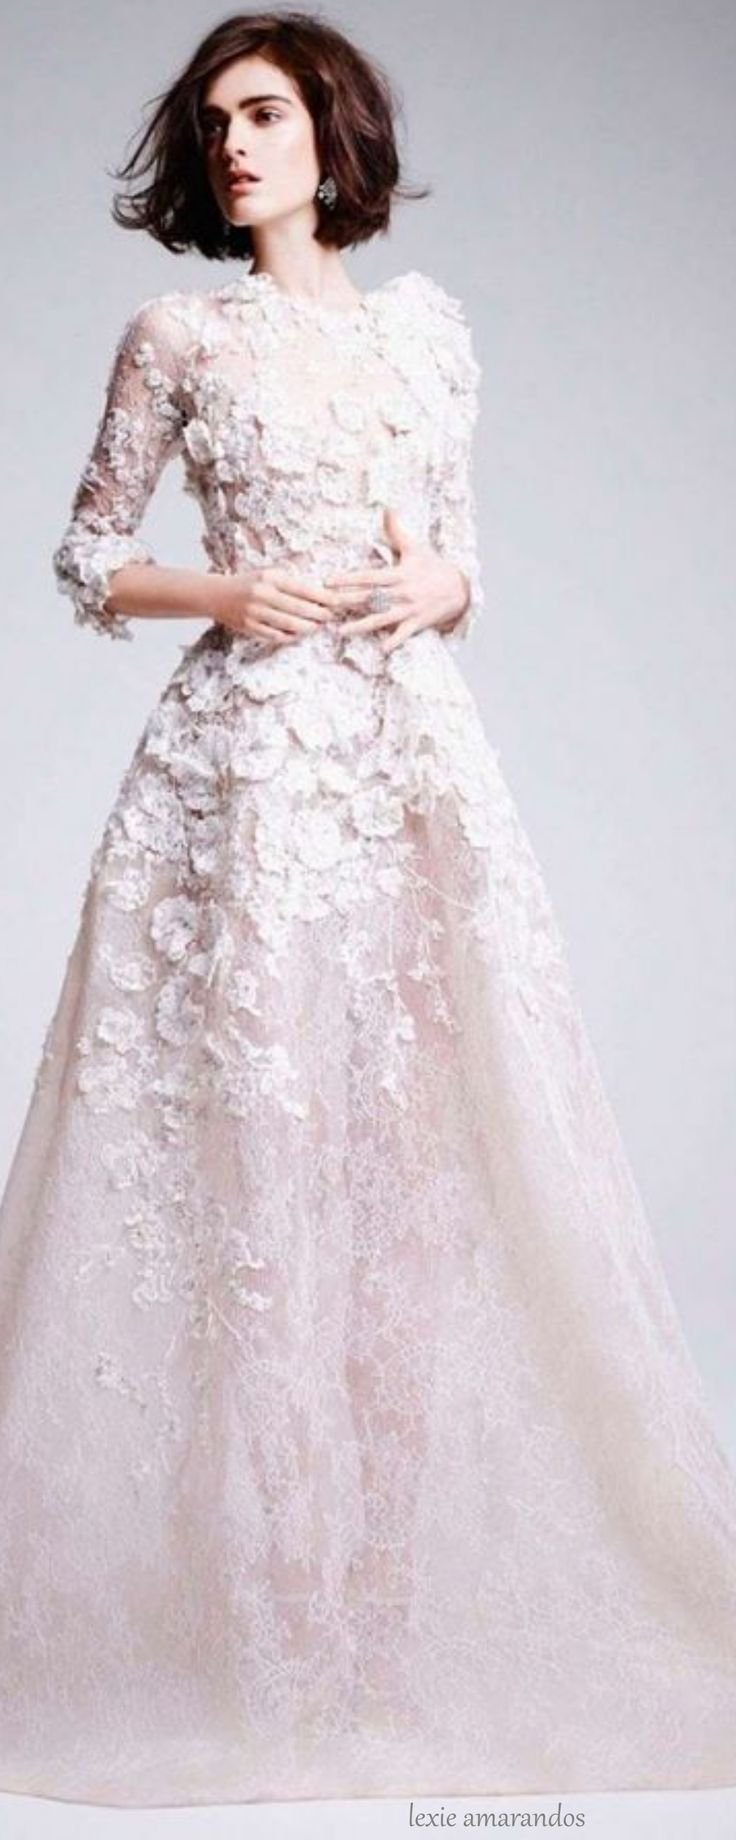 Elie Saab gown via @lexiea2. #gowns #ElieSaab